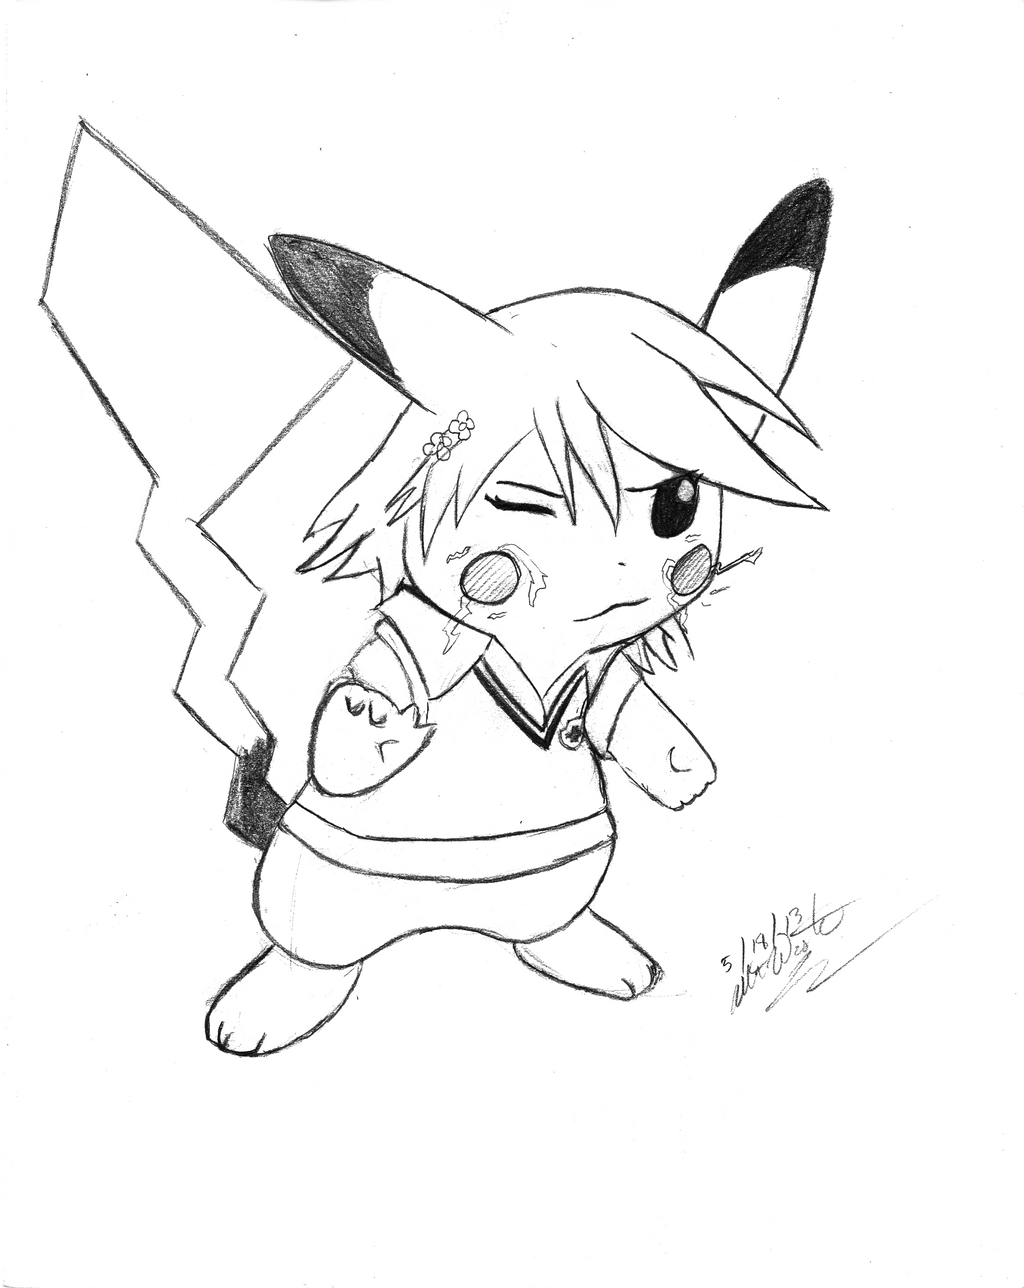 Sketch reqeust misaka pikachu by odysseywestra on deviantart sketch reqeust misaka pikachu by odysseywestra pronofoot35fo Gallery